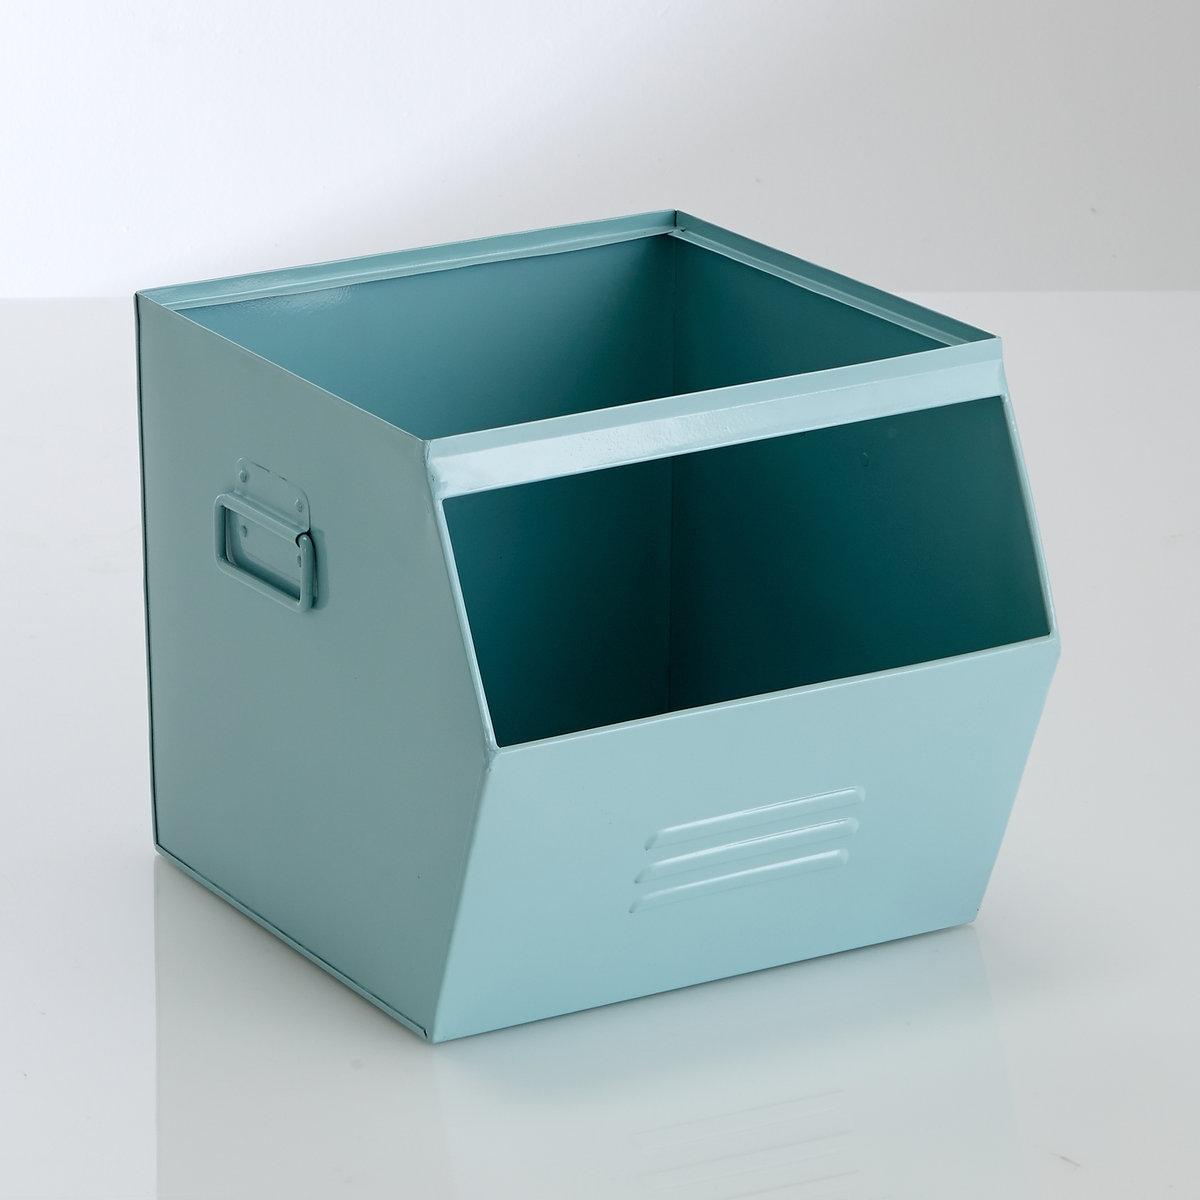 Ящик из гальванизированного металла, Hiba hiba javed when perceptions change